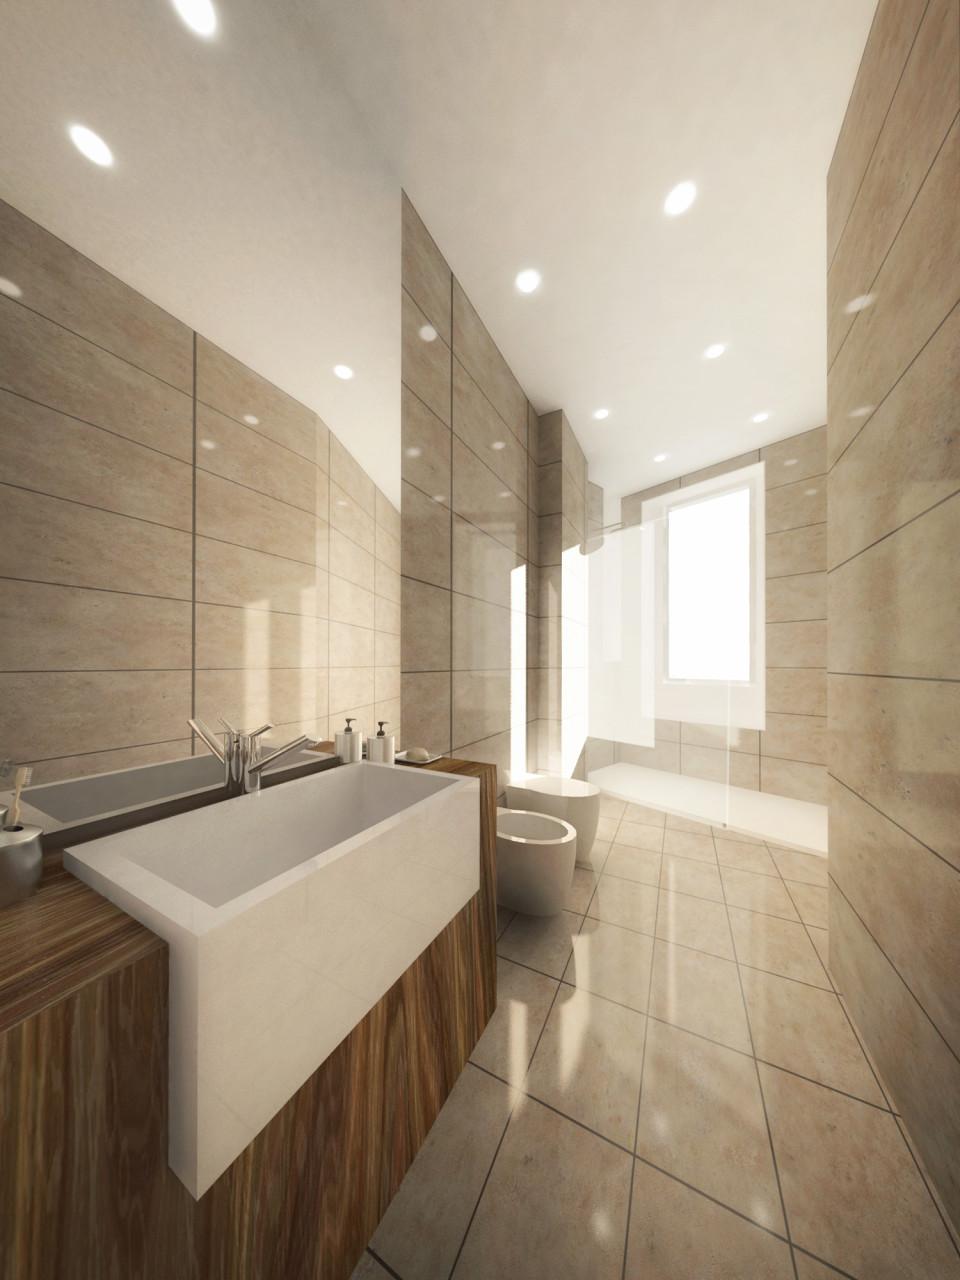 Wisp-Architects-Apartment-Milan 4